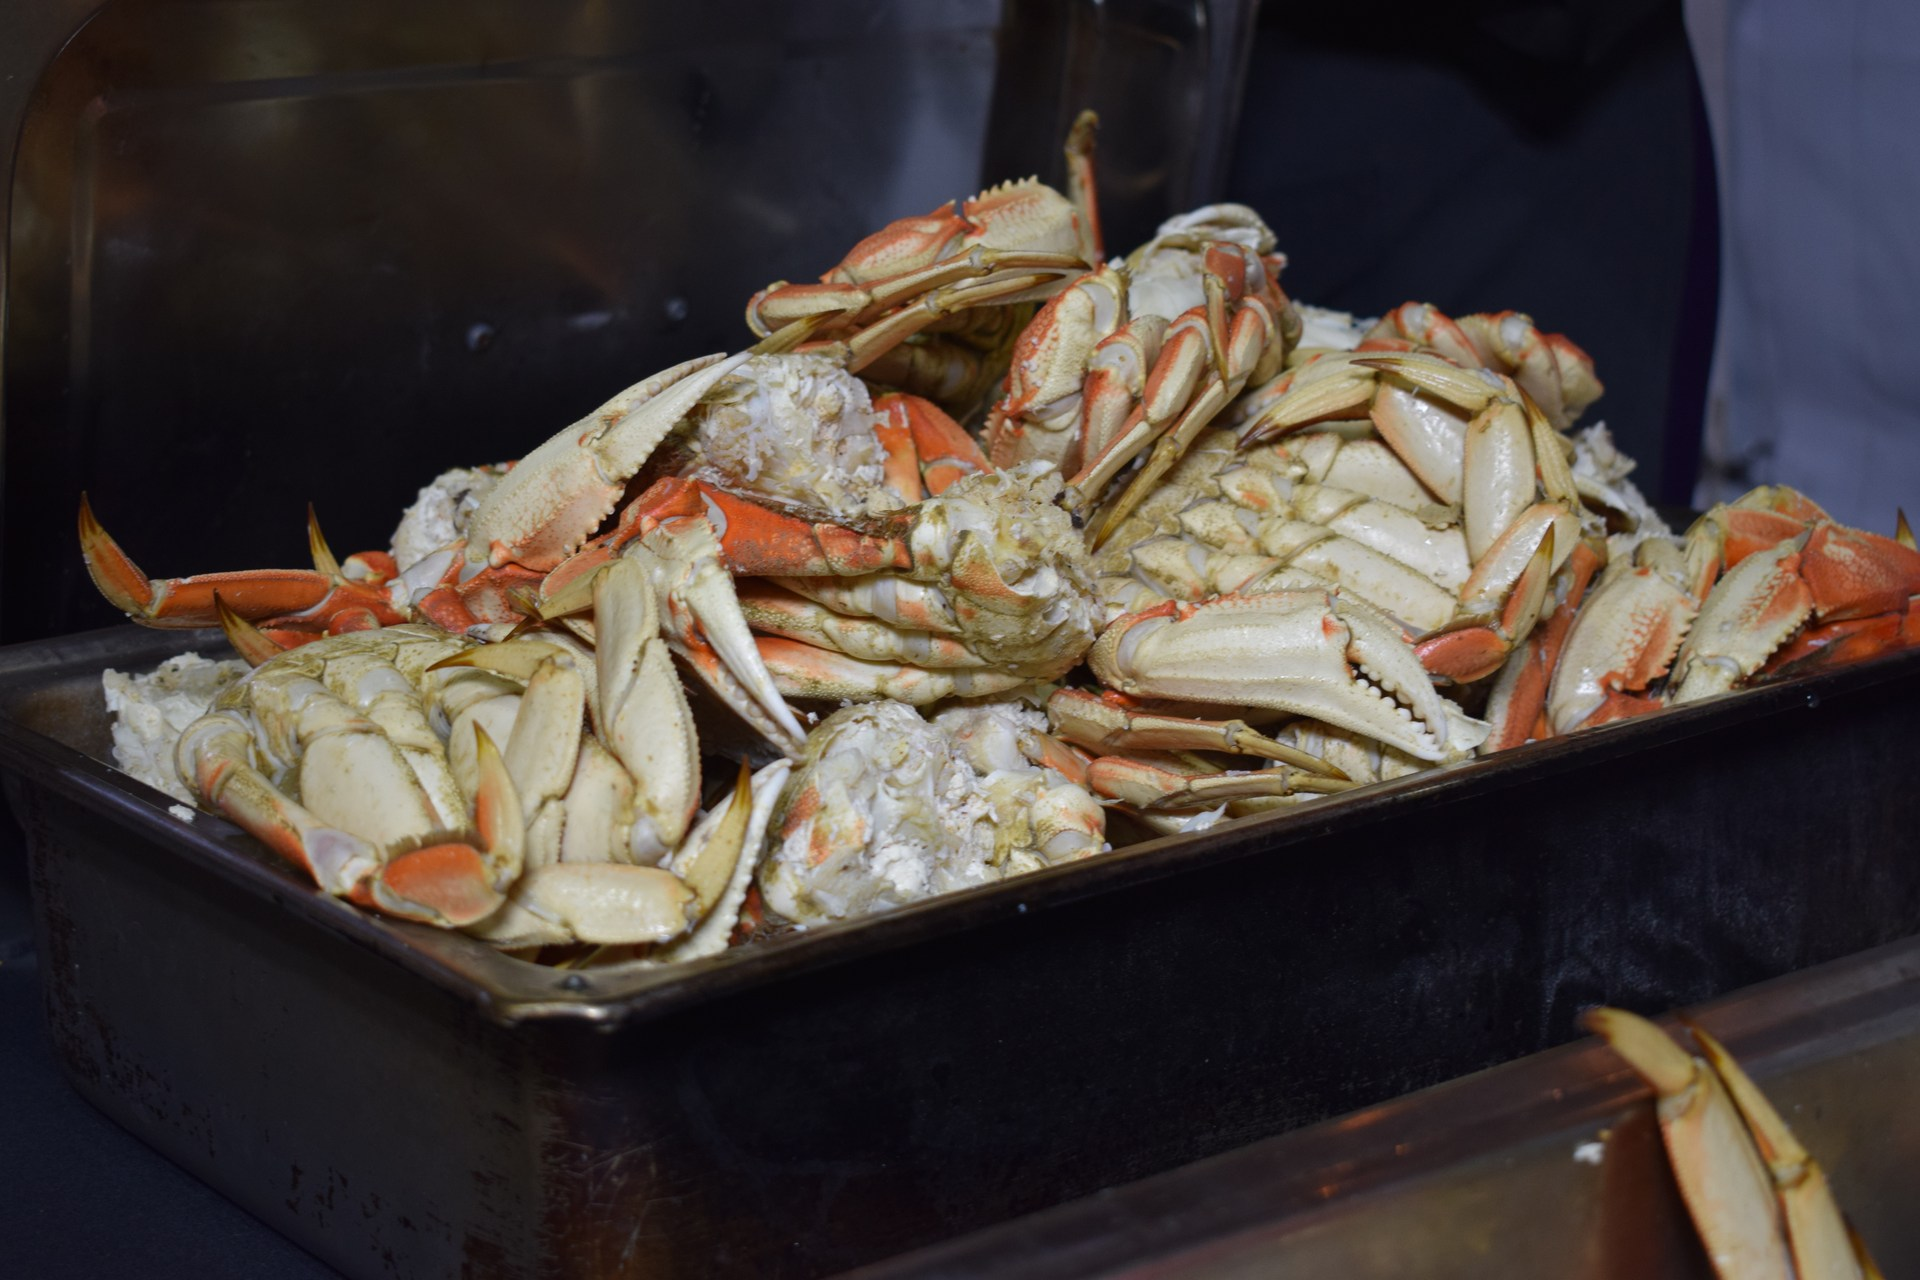 Pile of crab.